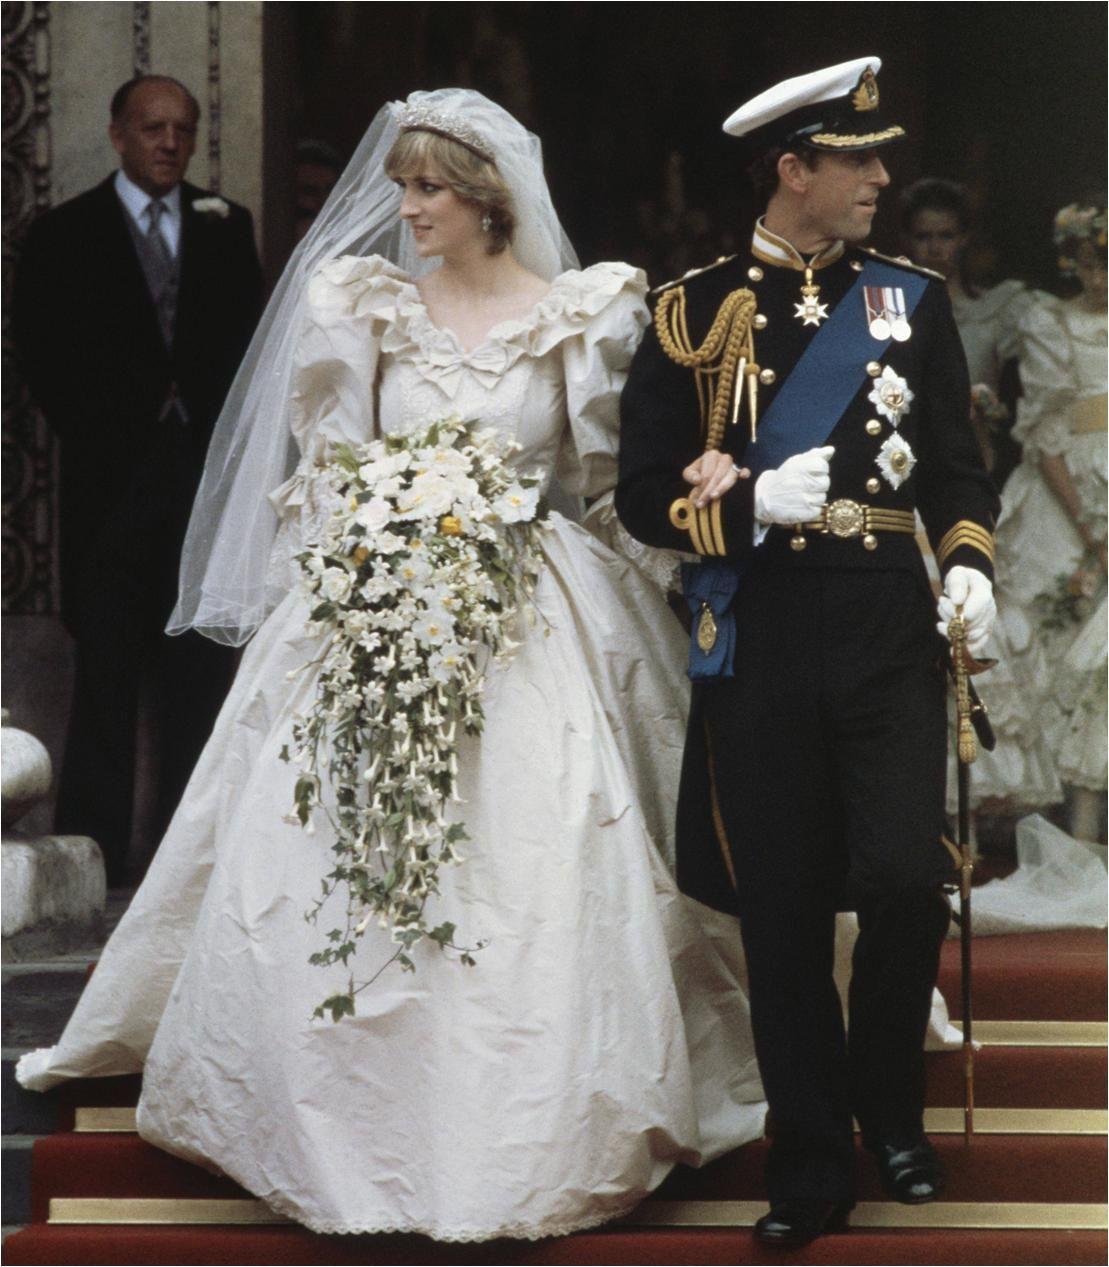 foto-ero-galereya-led-v-blomu-korseti-video-pornuha-russkaya-svadba